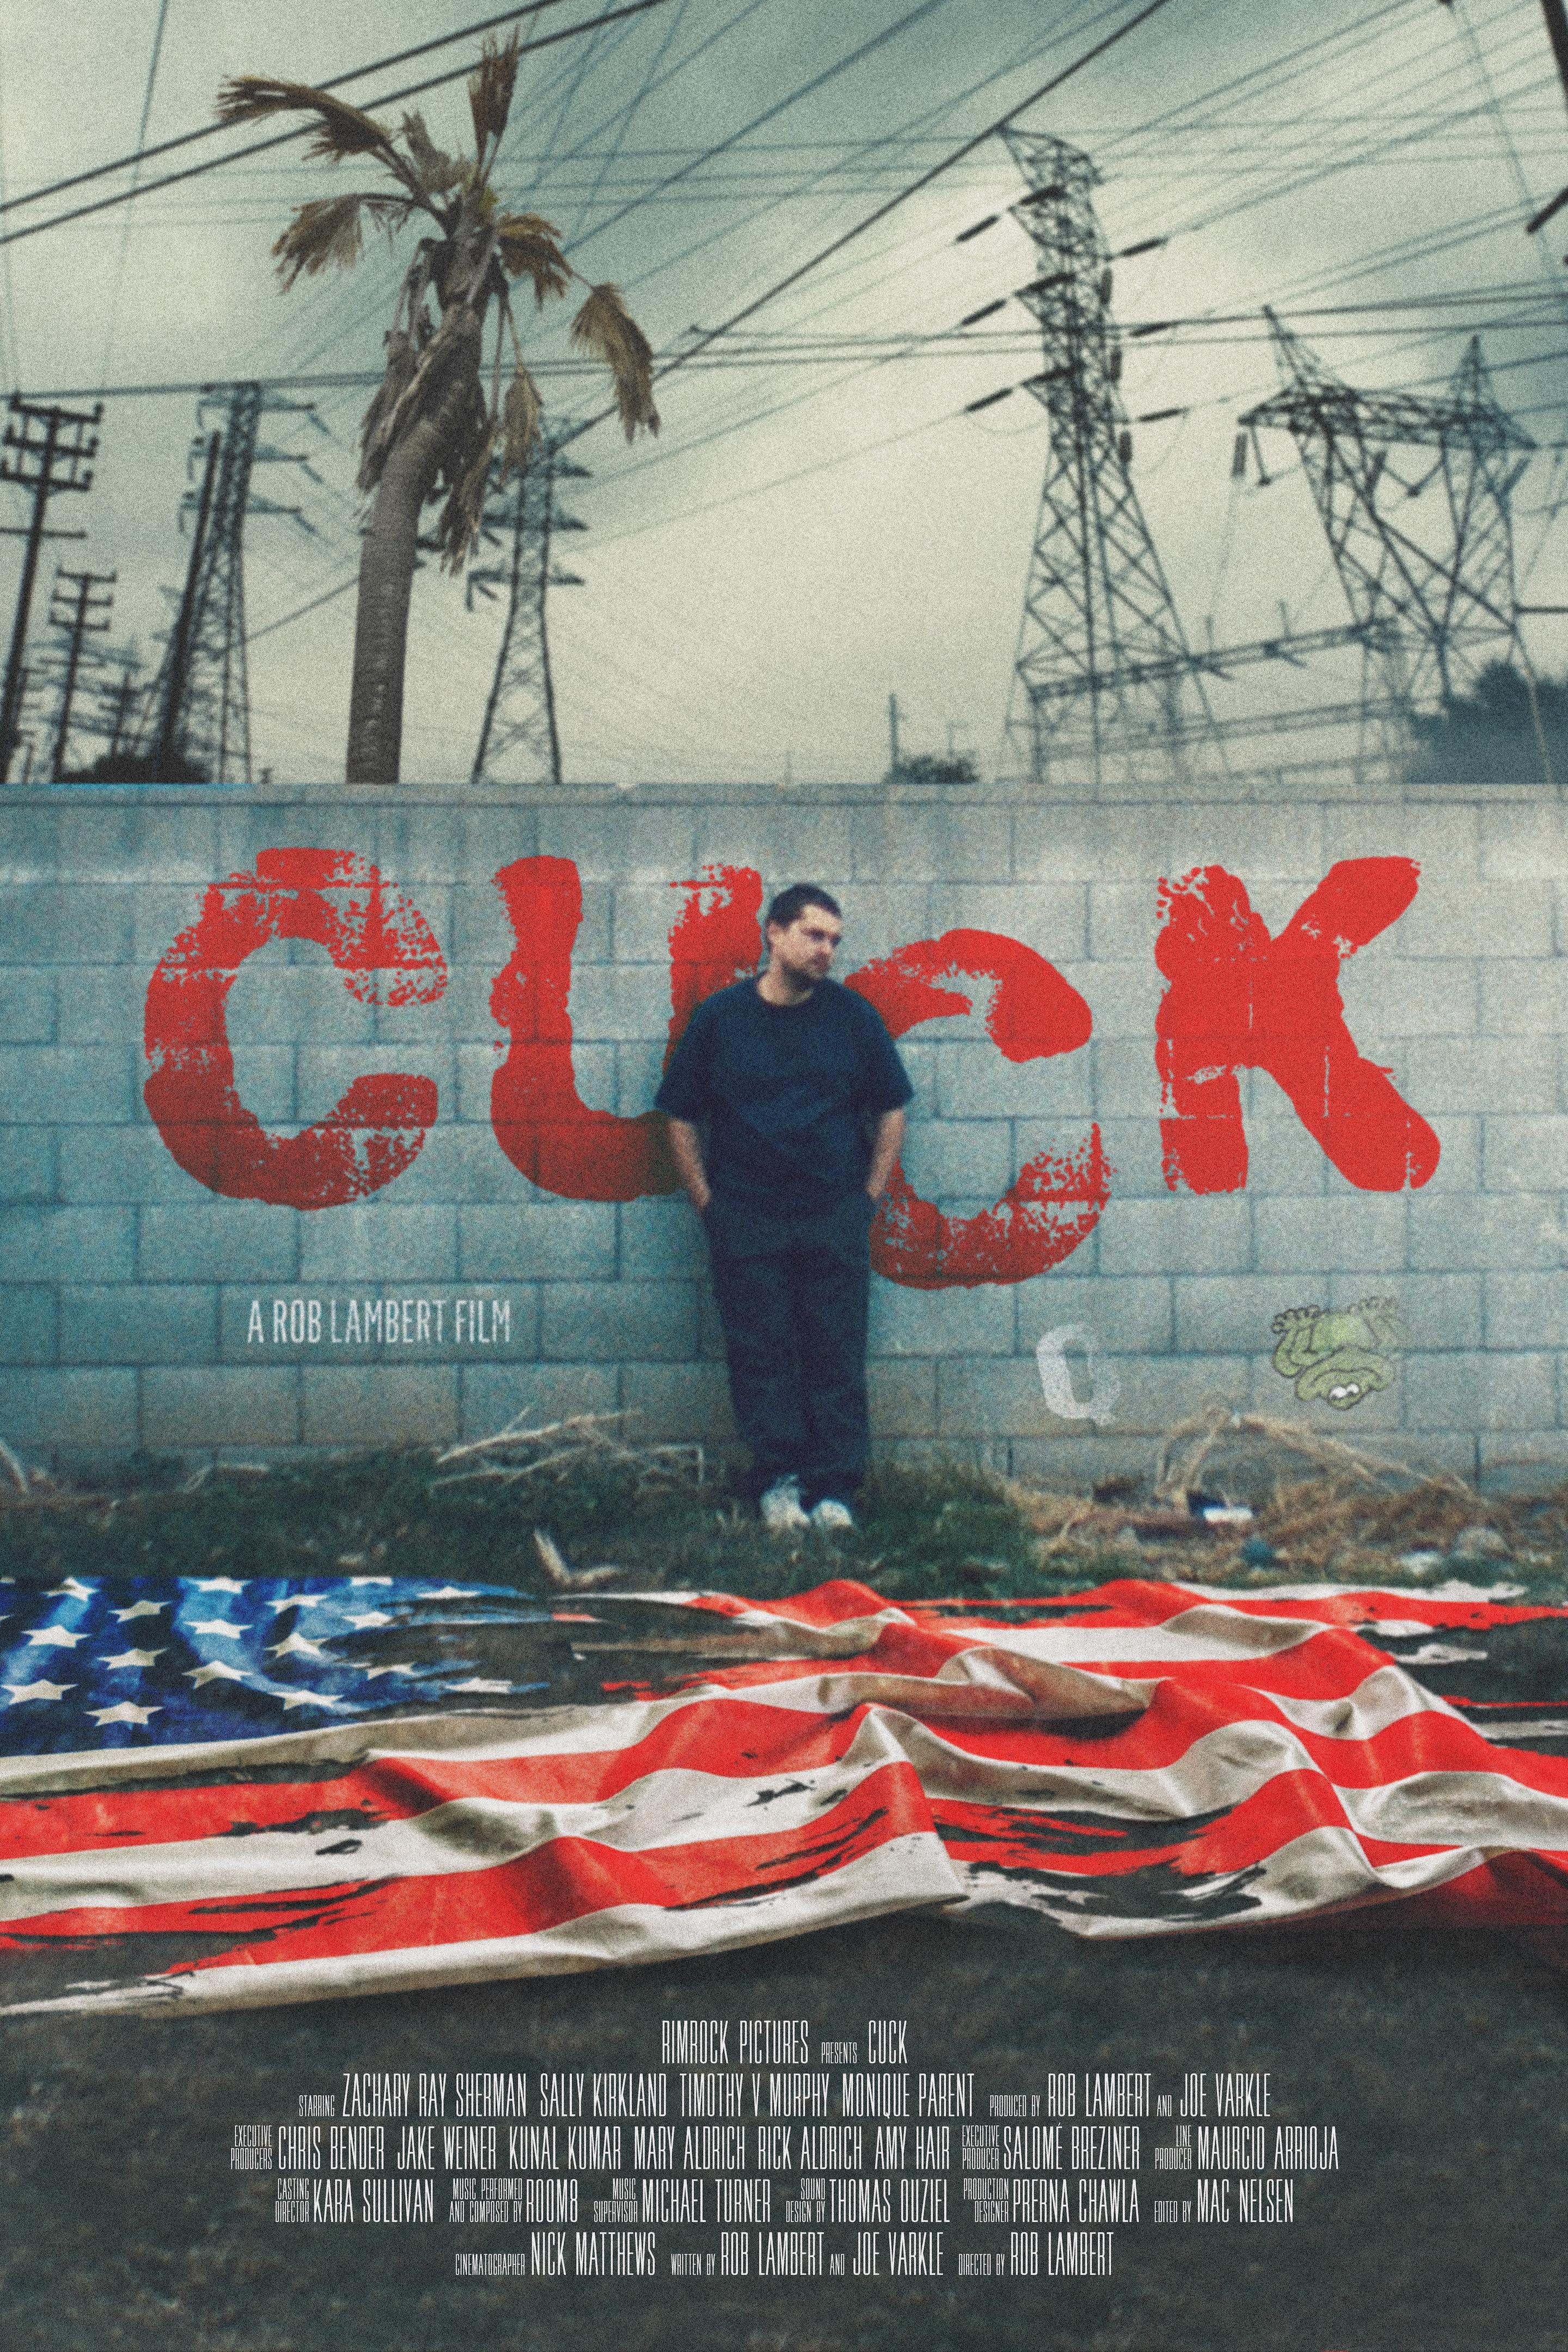 ĮSIŪTIS (2019) / Cuck